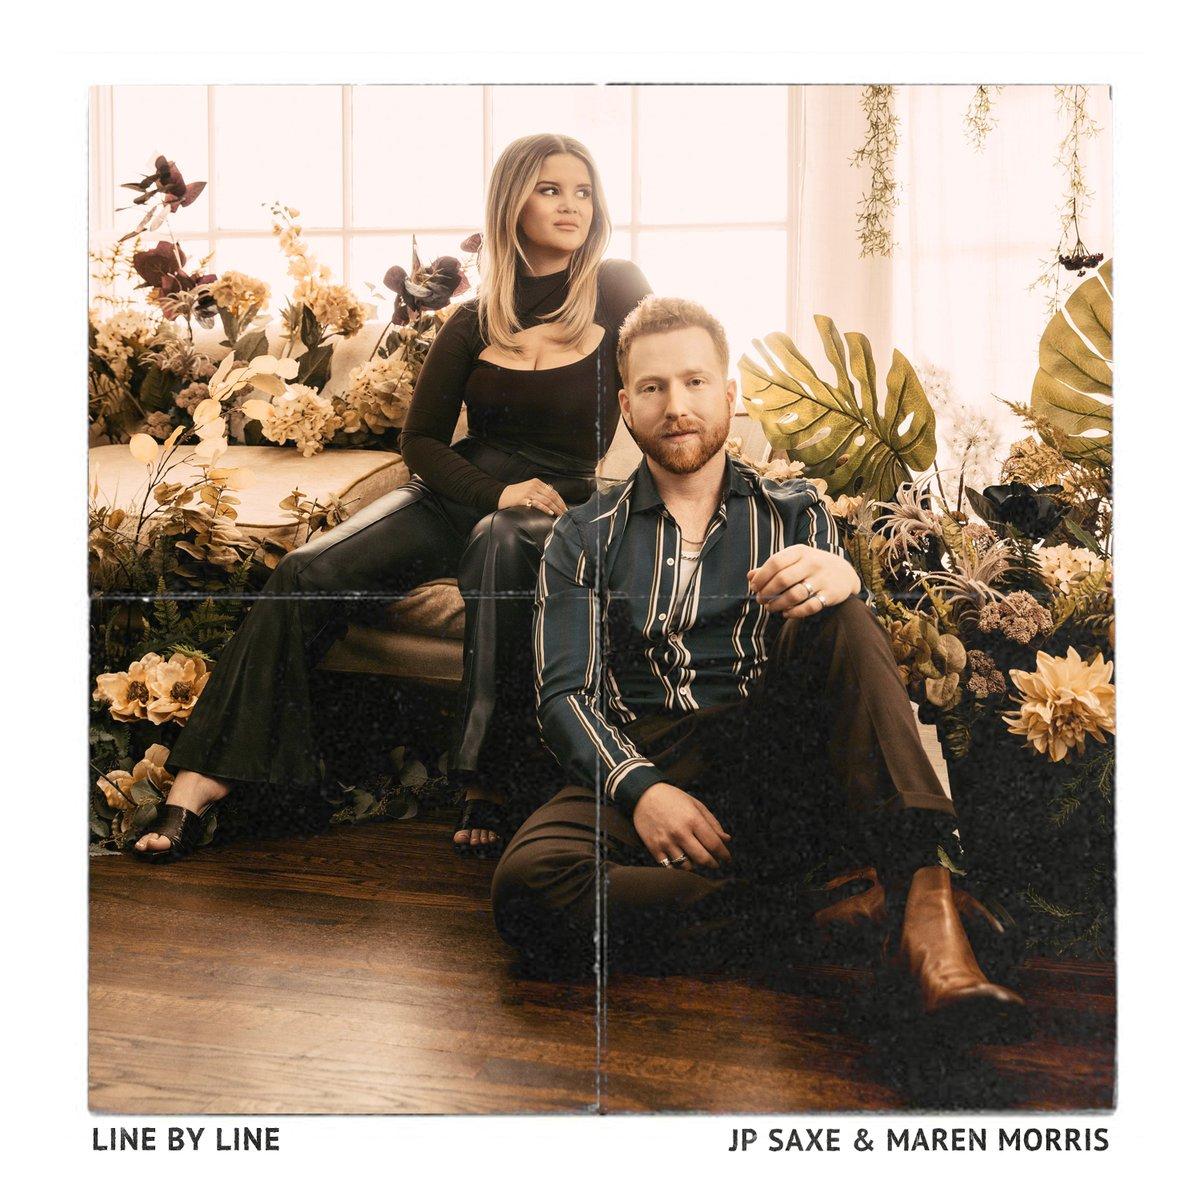 ".@jpsaxe and @MarenMorris drop new single ""Line By Line"" https://t.co/JRgAwLkYnV https://t.co/rf5jiQF0bK"